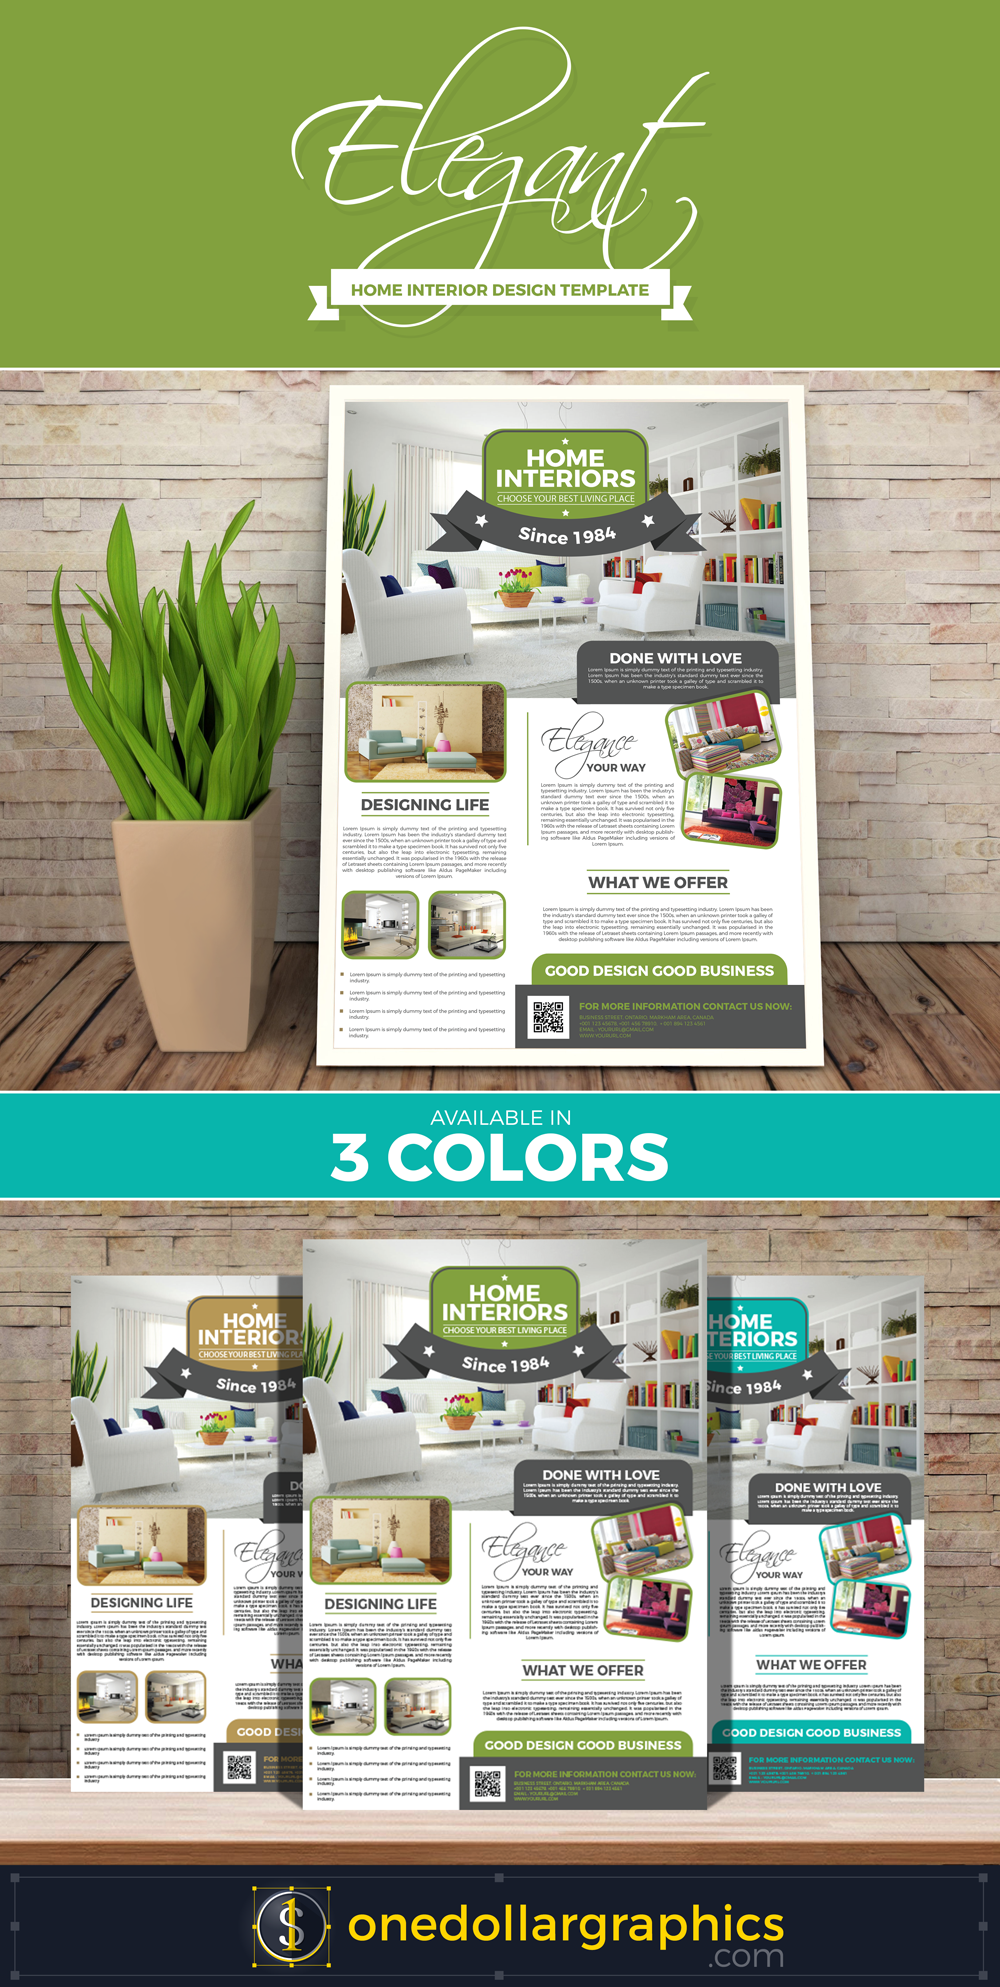 Elegant-Home-Interior-Design-Template-Preview